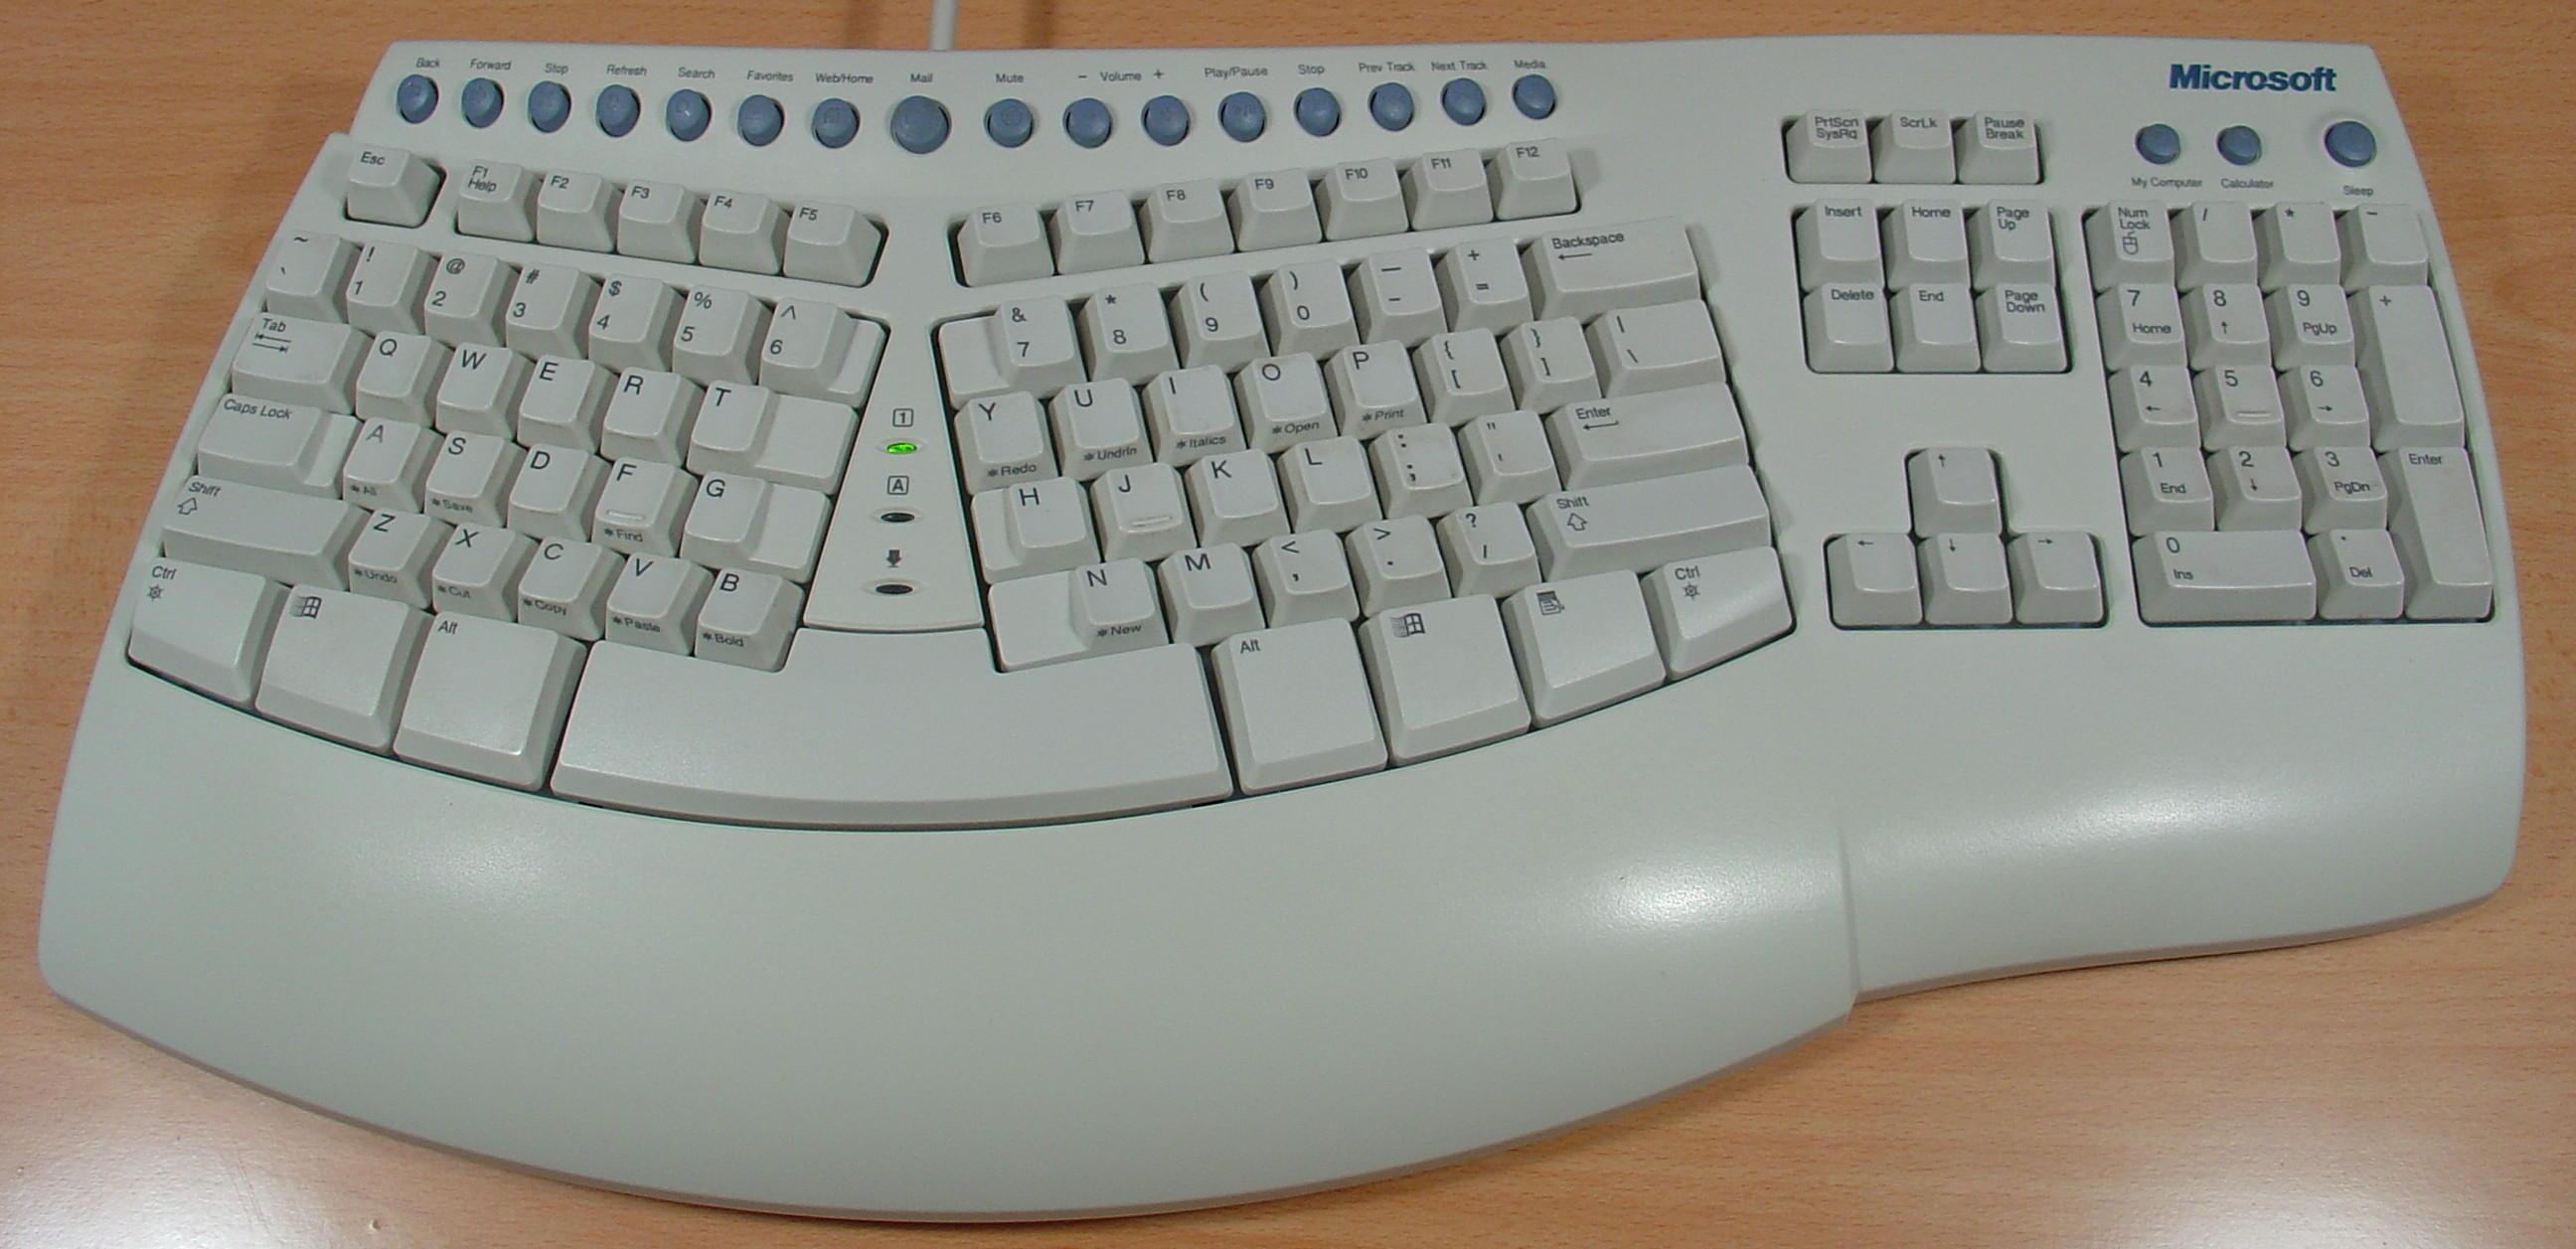 PC Classic Mini - Computador que nos leva de volta ao MS-DOS e jogos em disquete Microsoft_Natural_Keyboard_Pro_44161